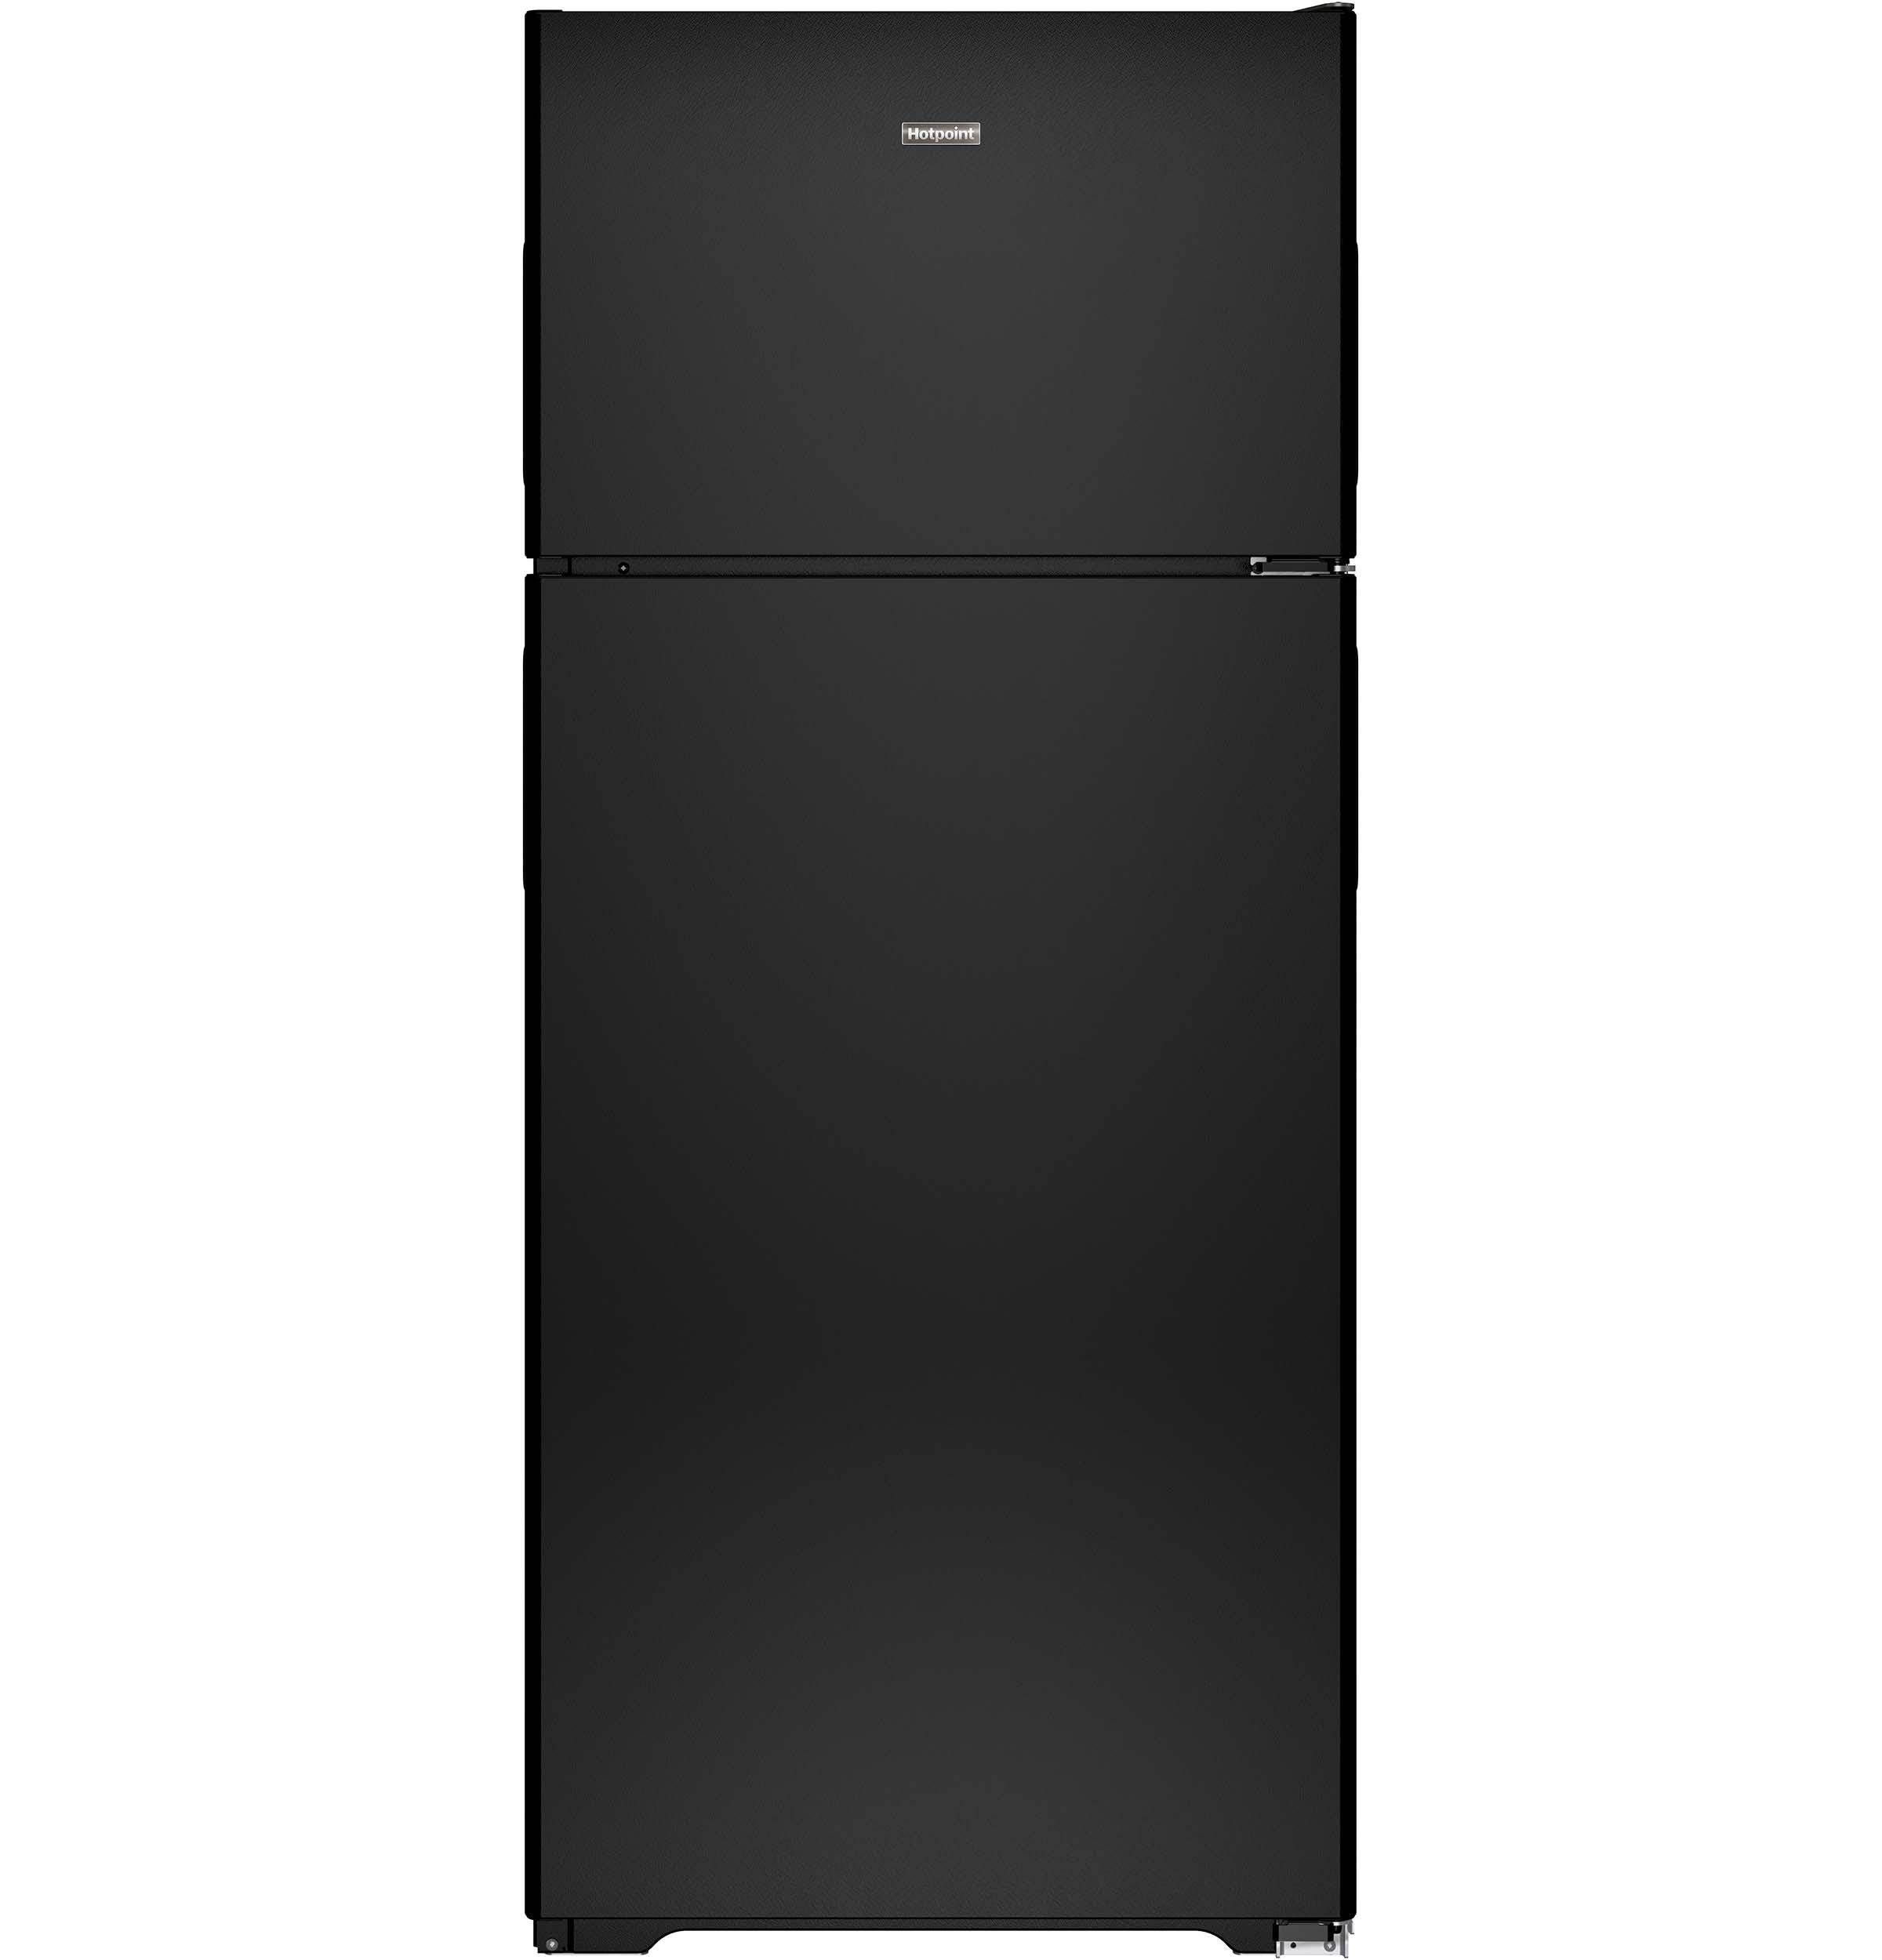 Hotpoint Hotpoint® 17.5 Cu. Ft. Top-Freezer Refrigerator